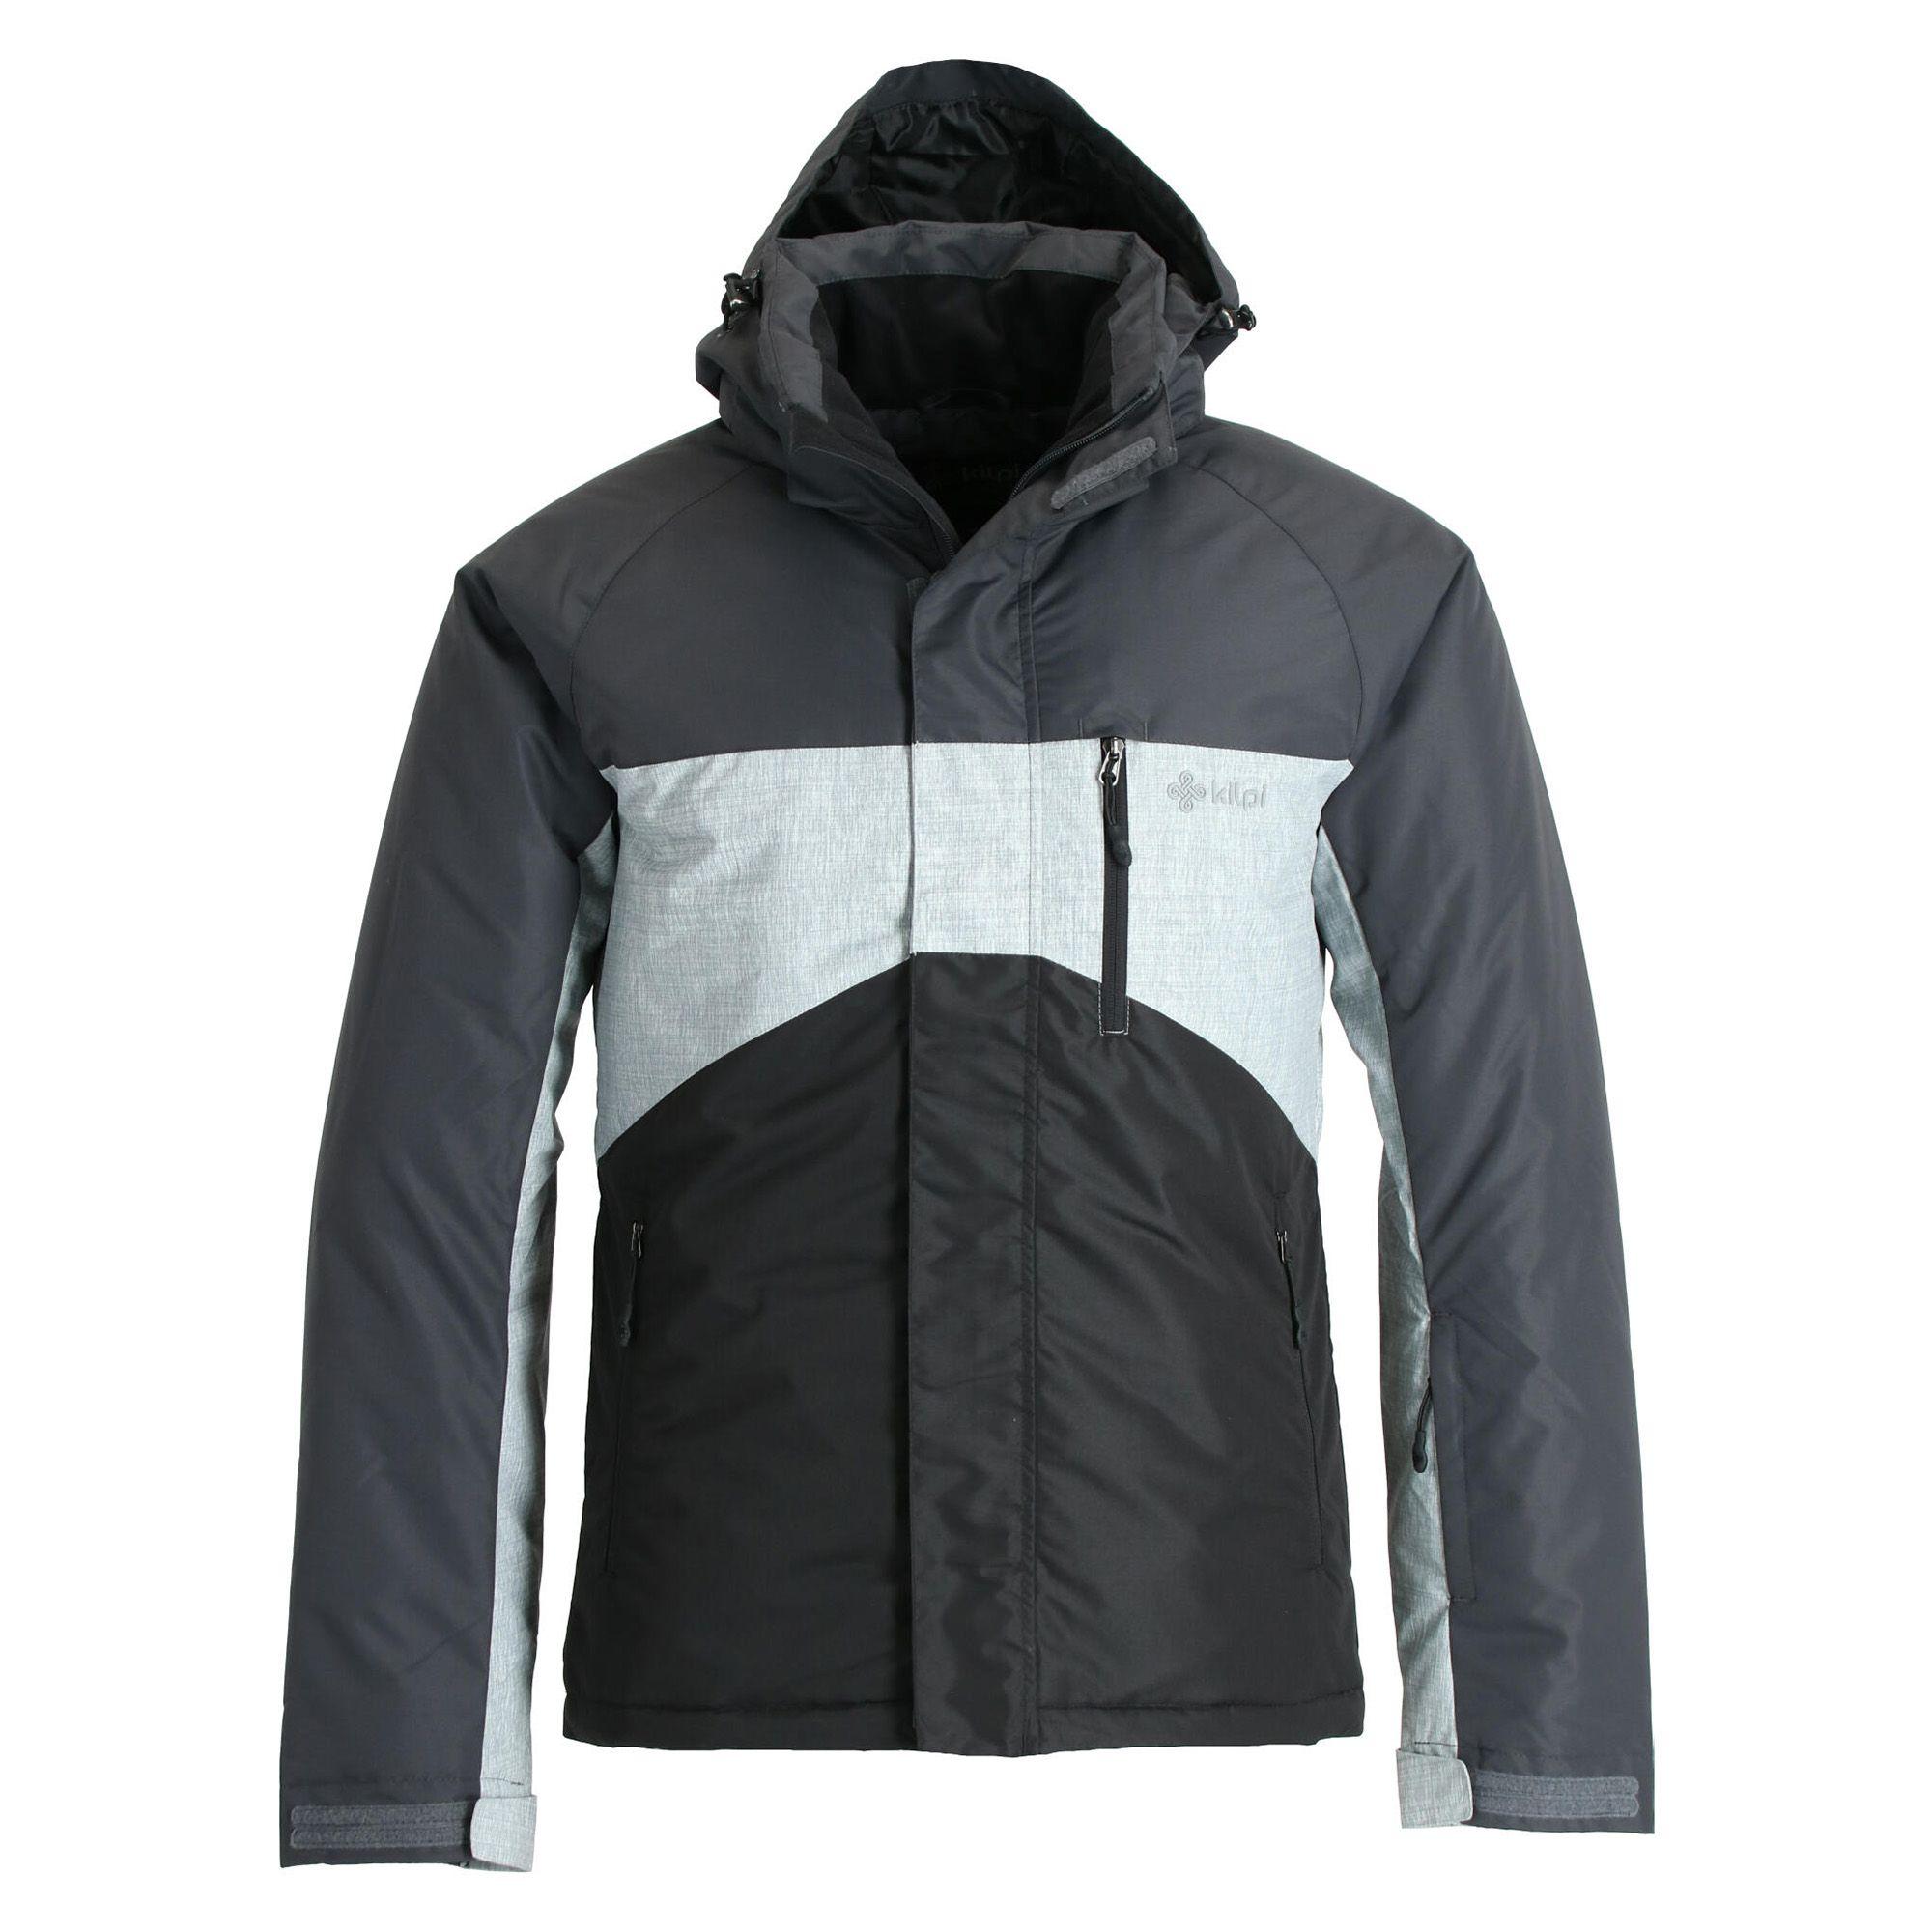 Kilpi, Ober, ski jas, grote maten, heren, zwart • SkiWebShop